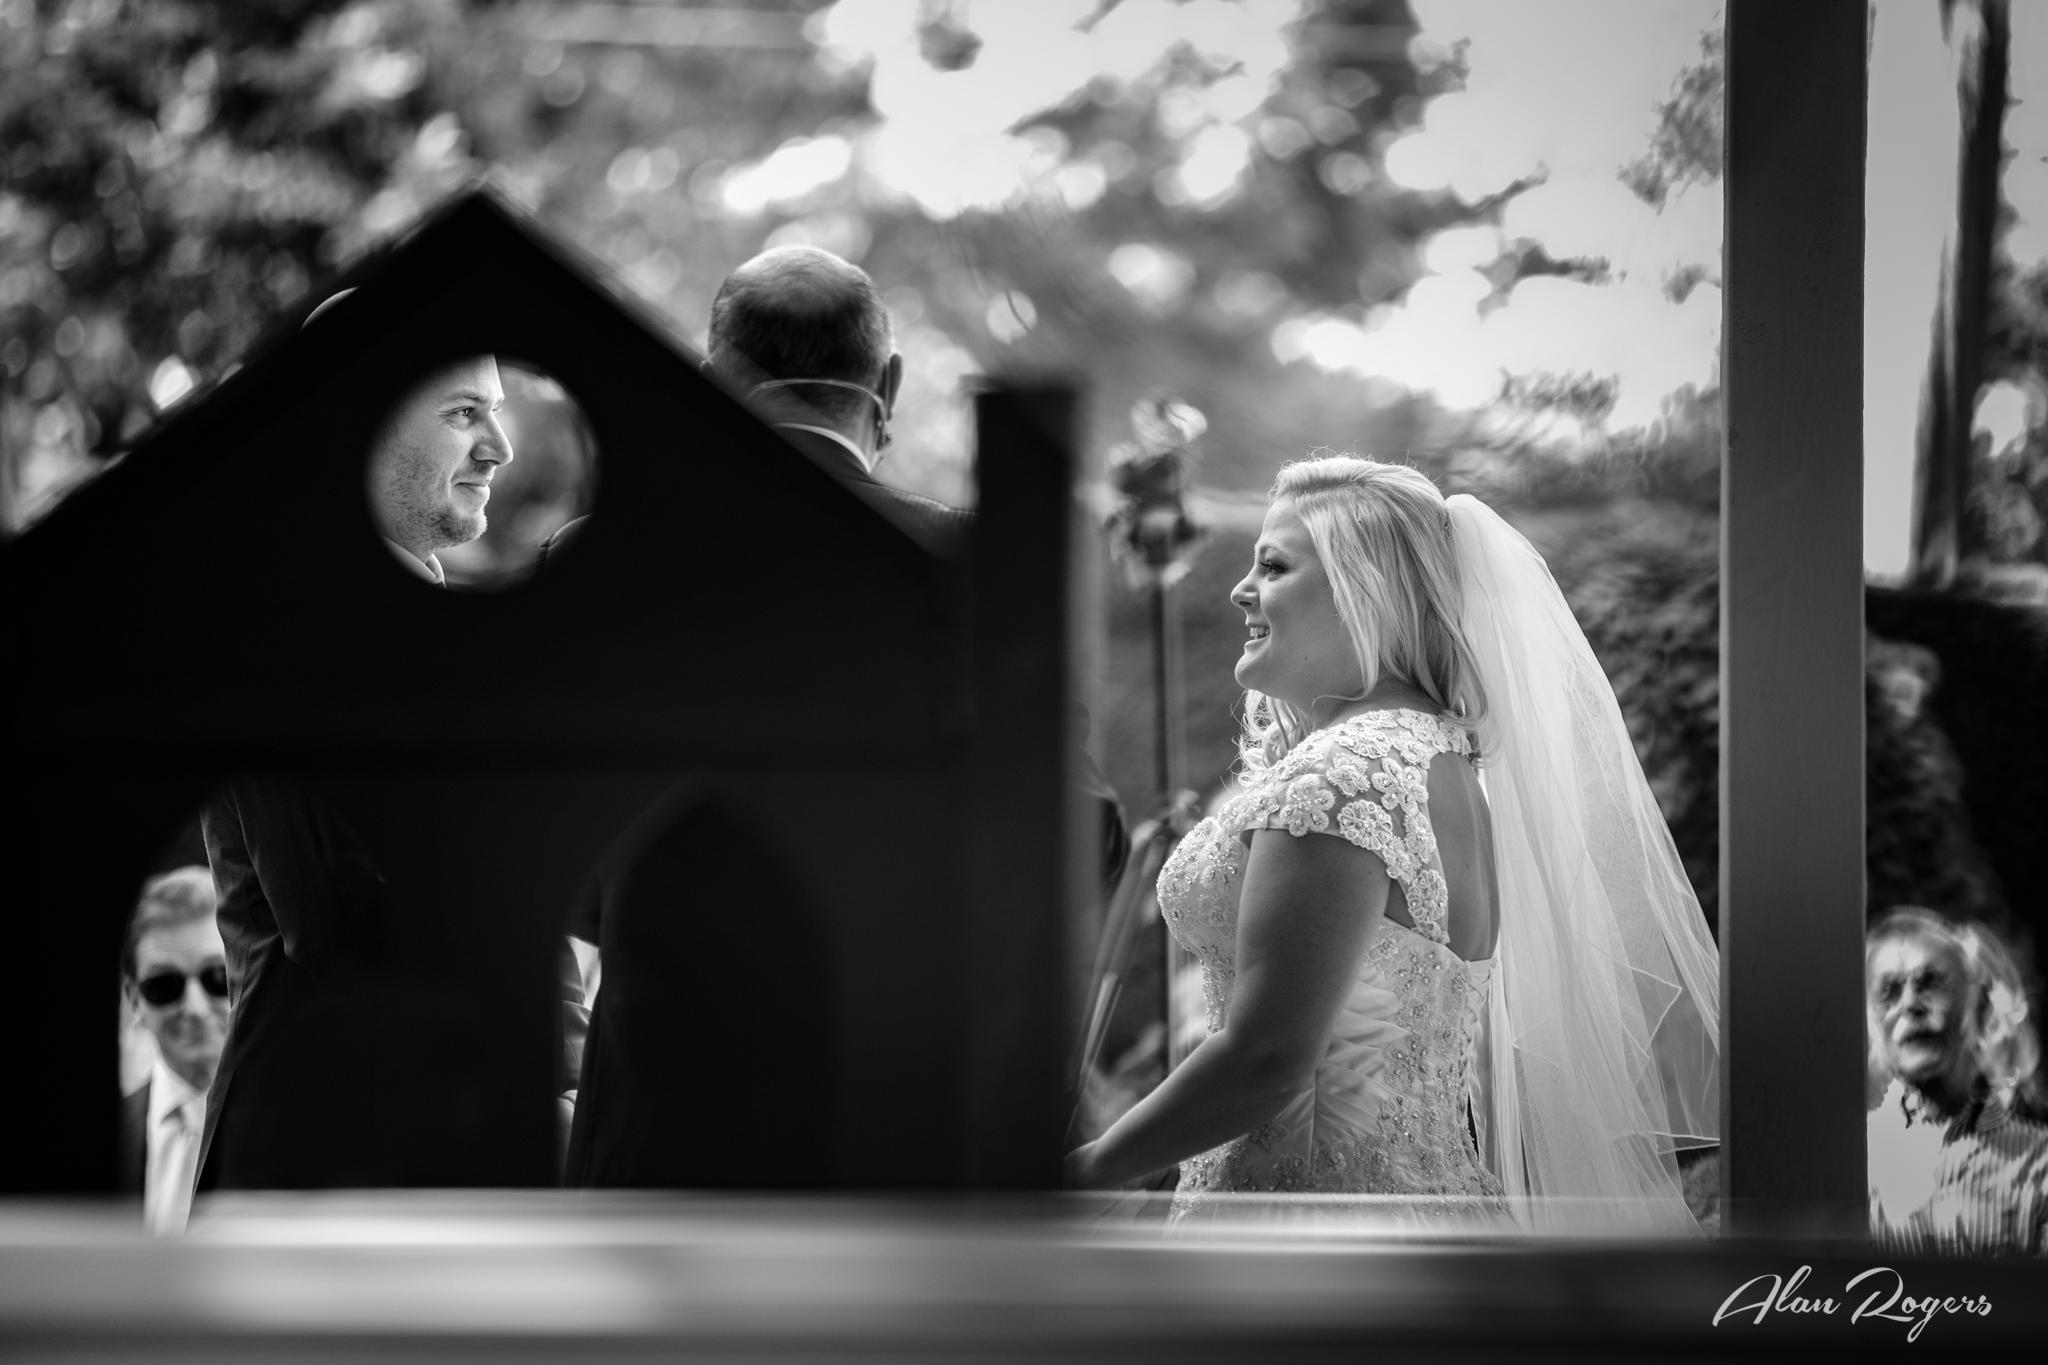 rear-view-ceremony.jpg